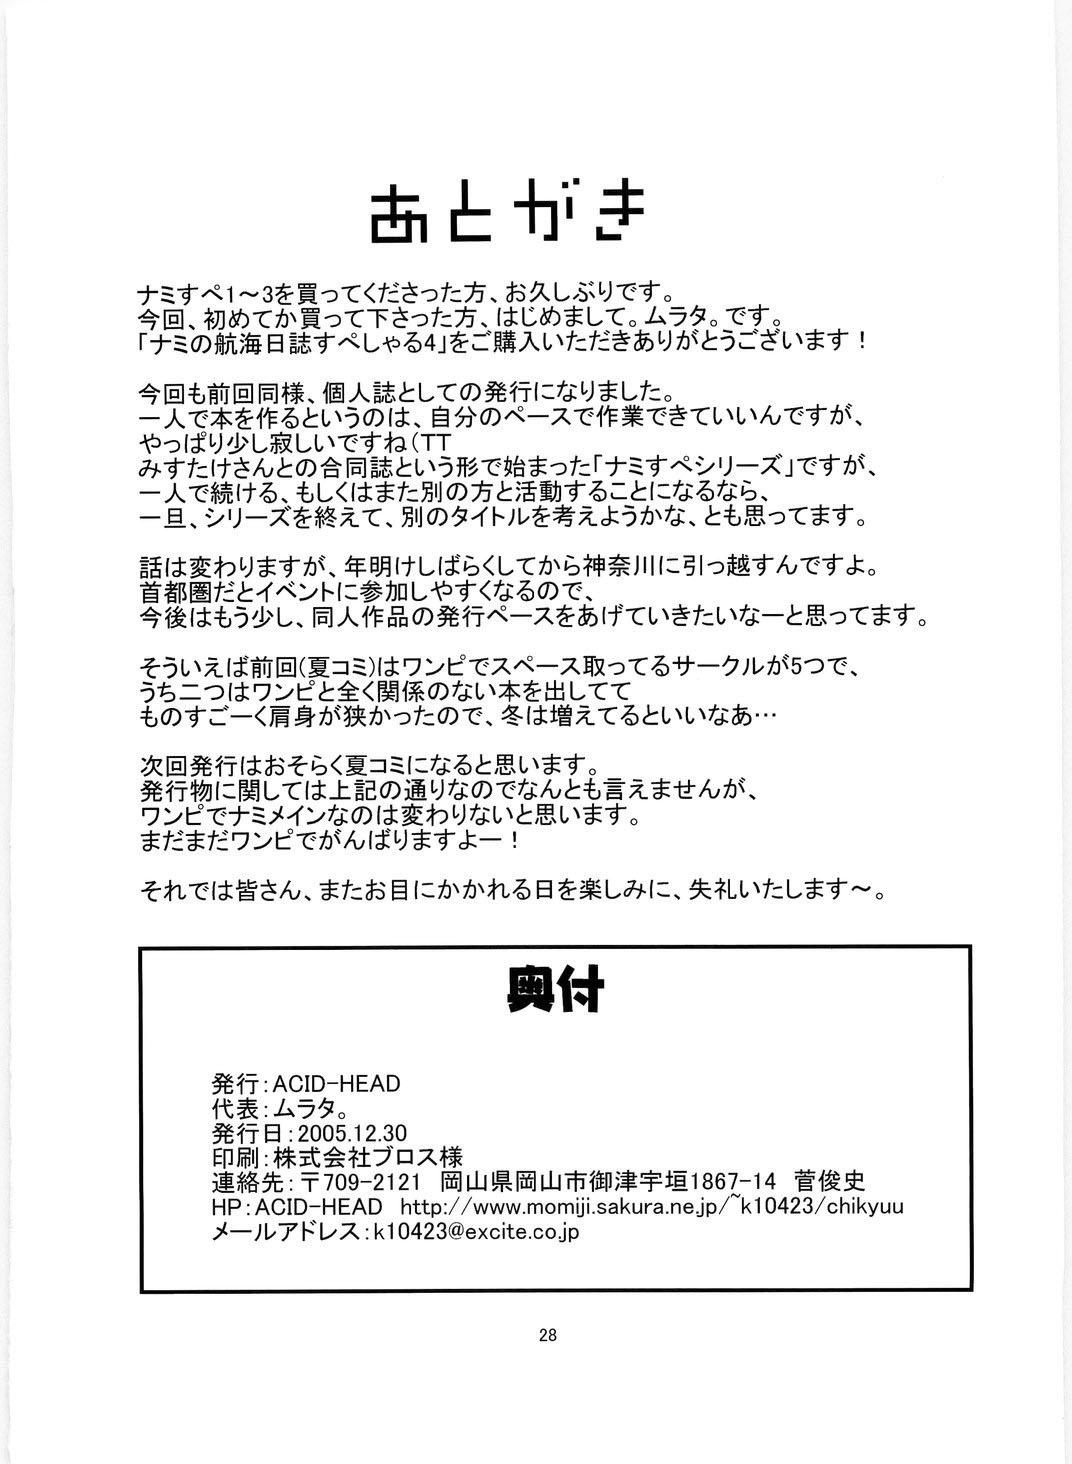 Nami no Koukai Nisshi Special 4 29